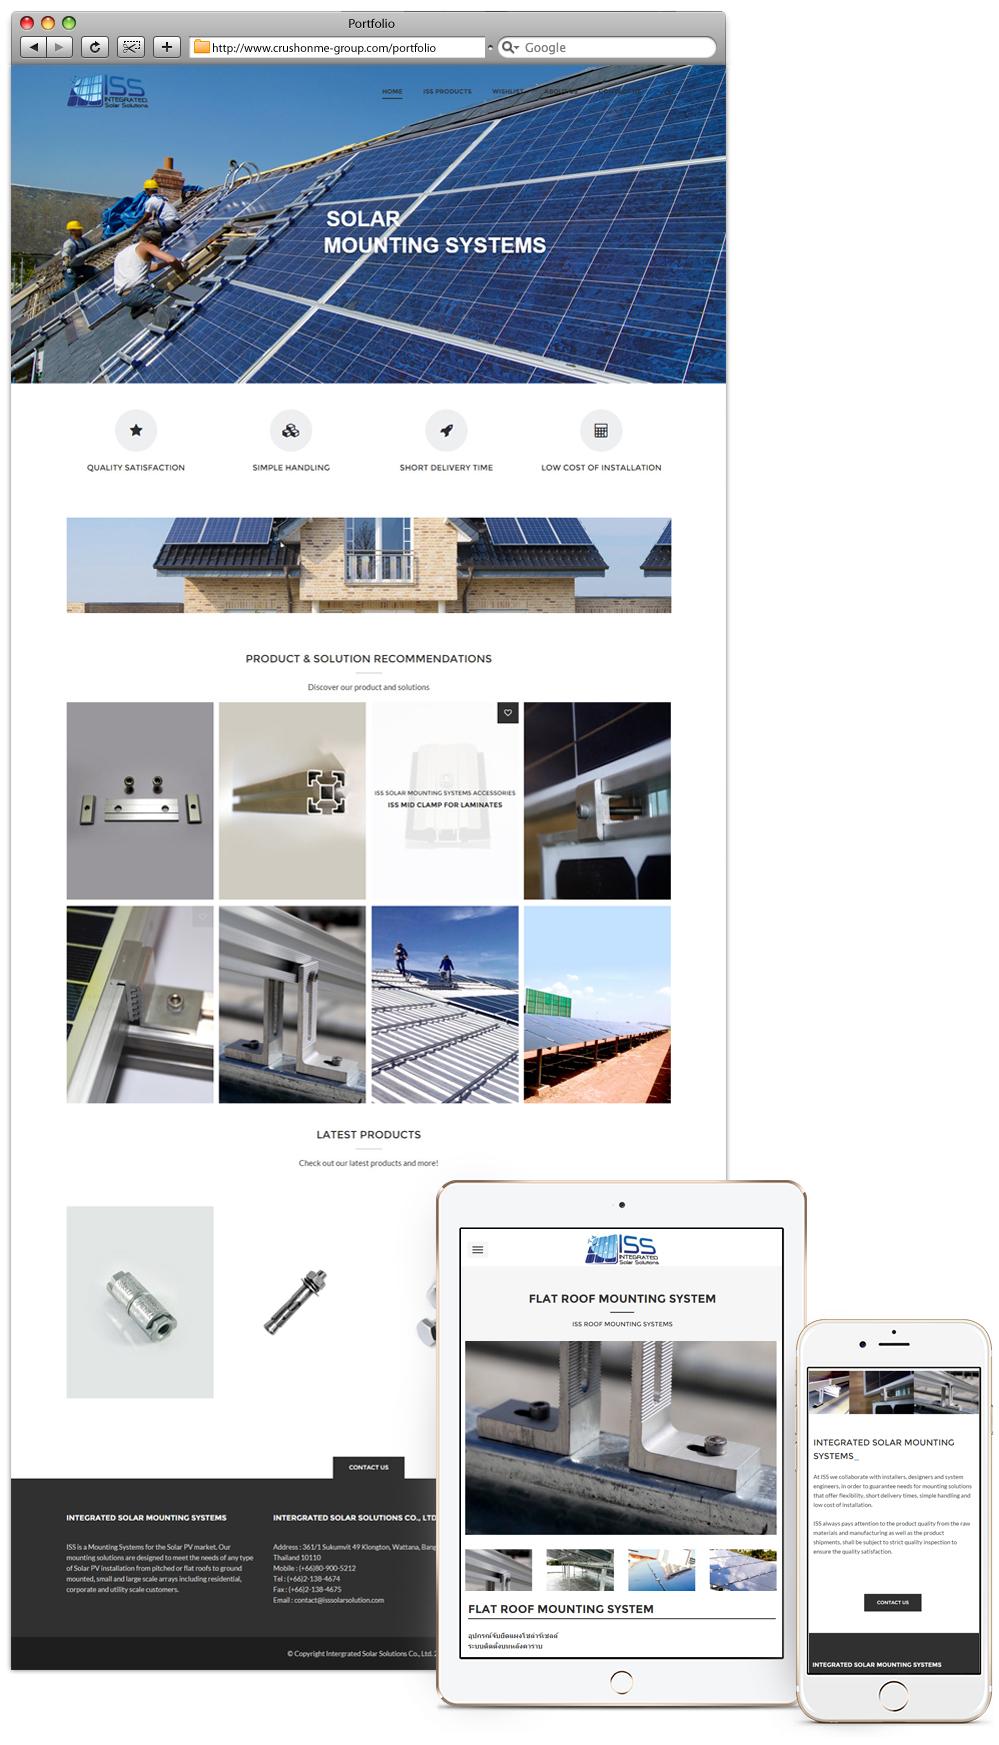 iss-solar-solution-ติดตั้งแผงโซล่า-crushonme-รับออกแบบเว็บไซต์-บริษัทรับทำ-Website-ครัชออนมี